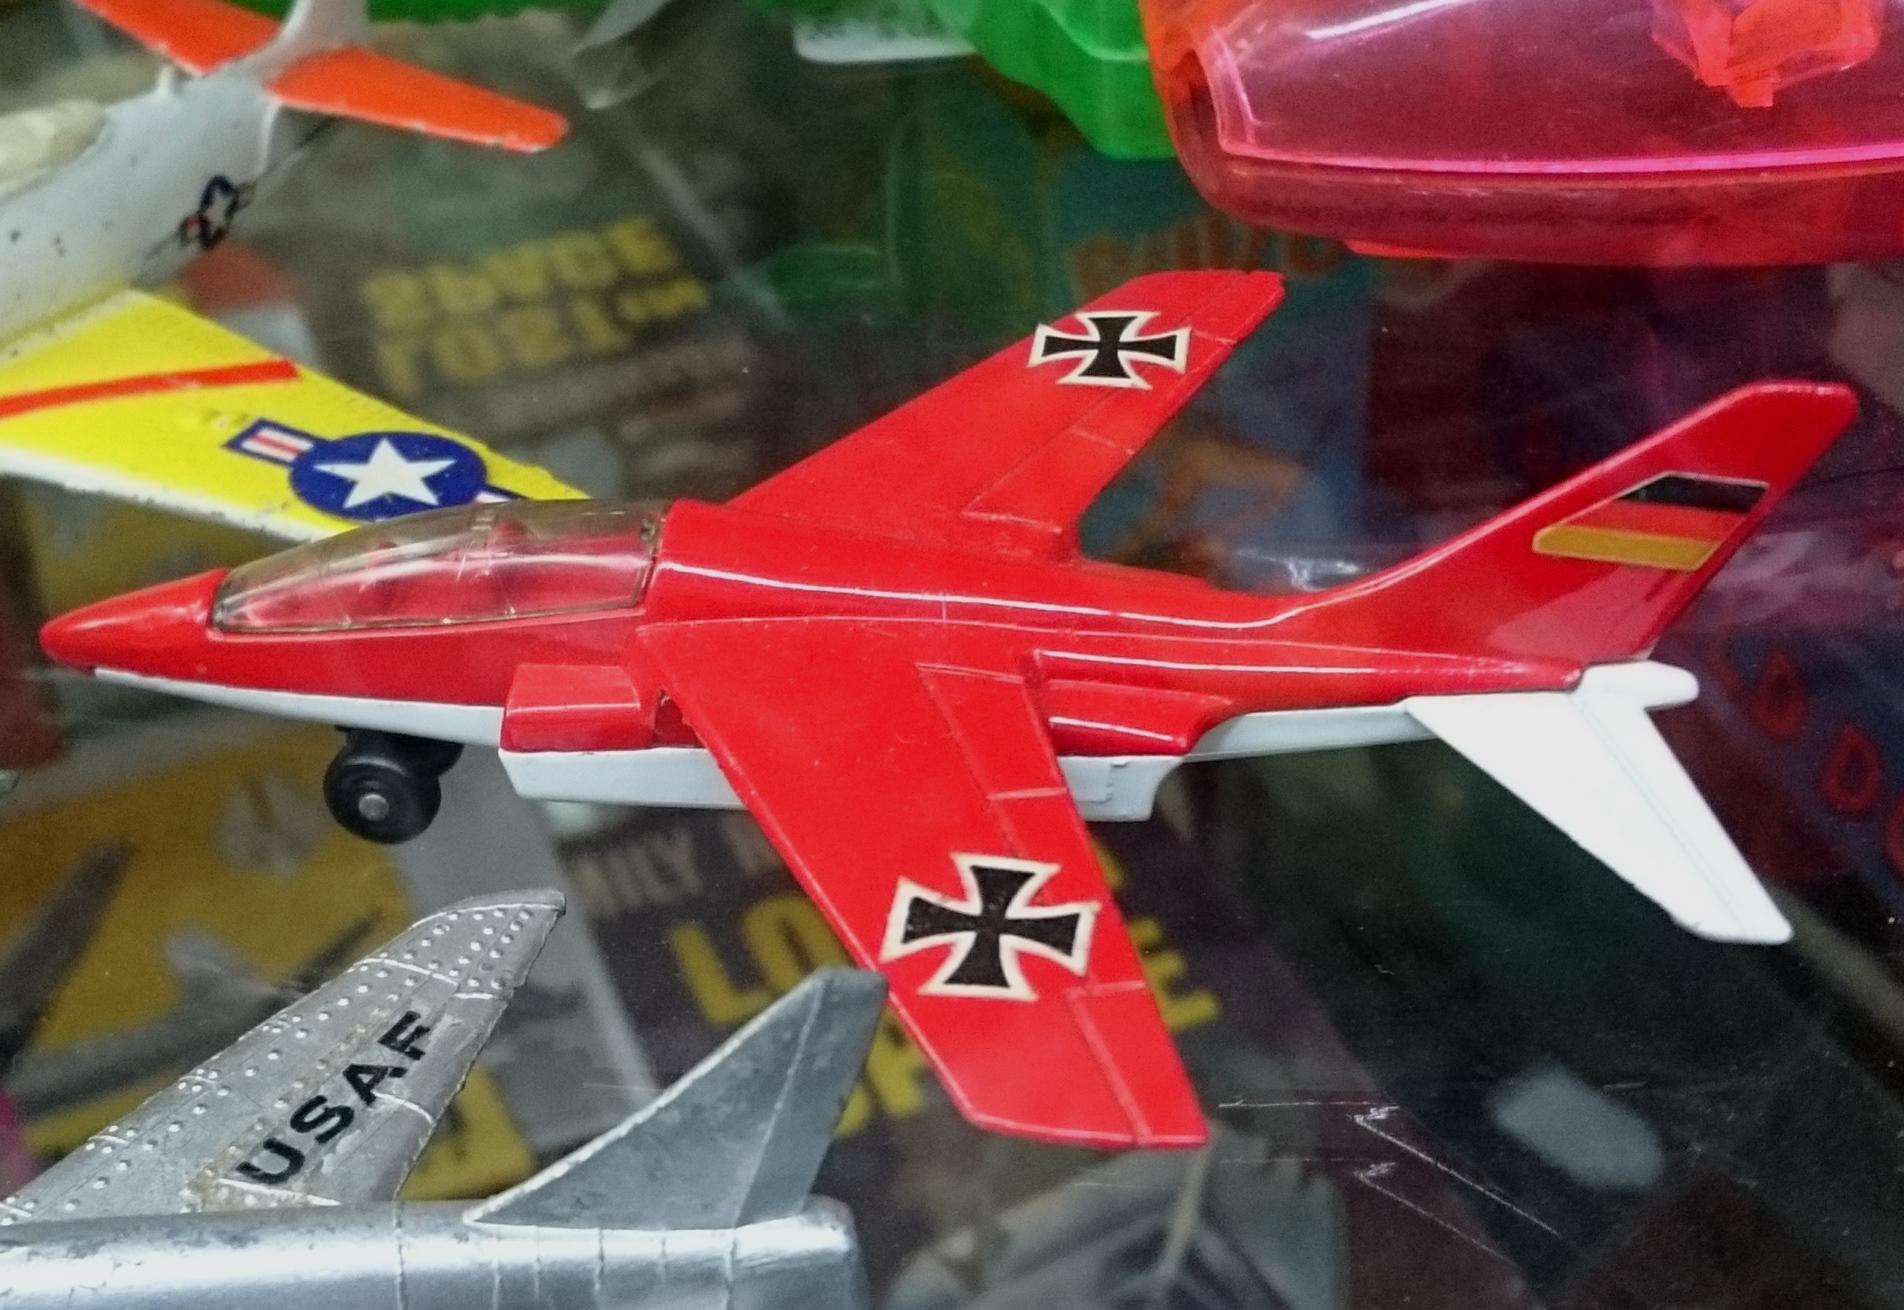 Alpha Jet (SB-11)